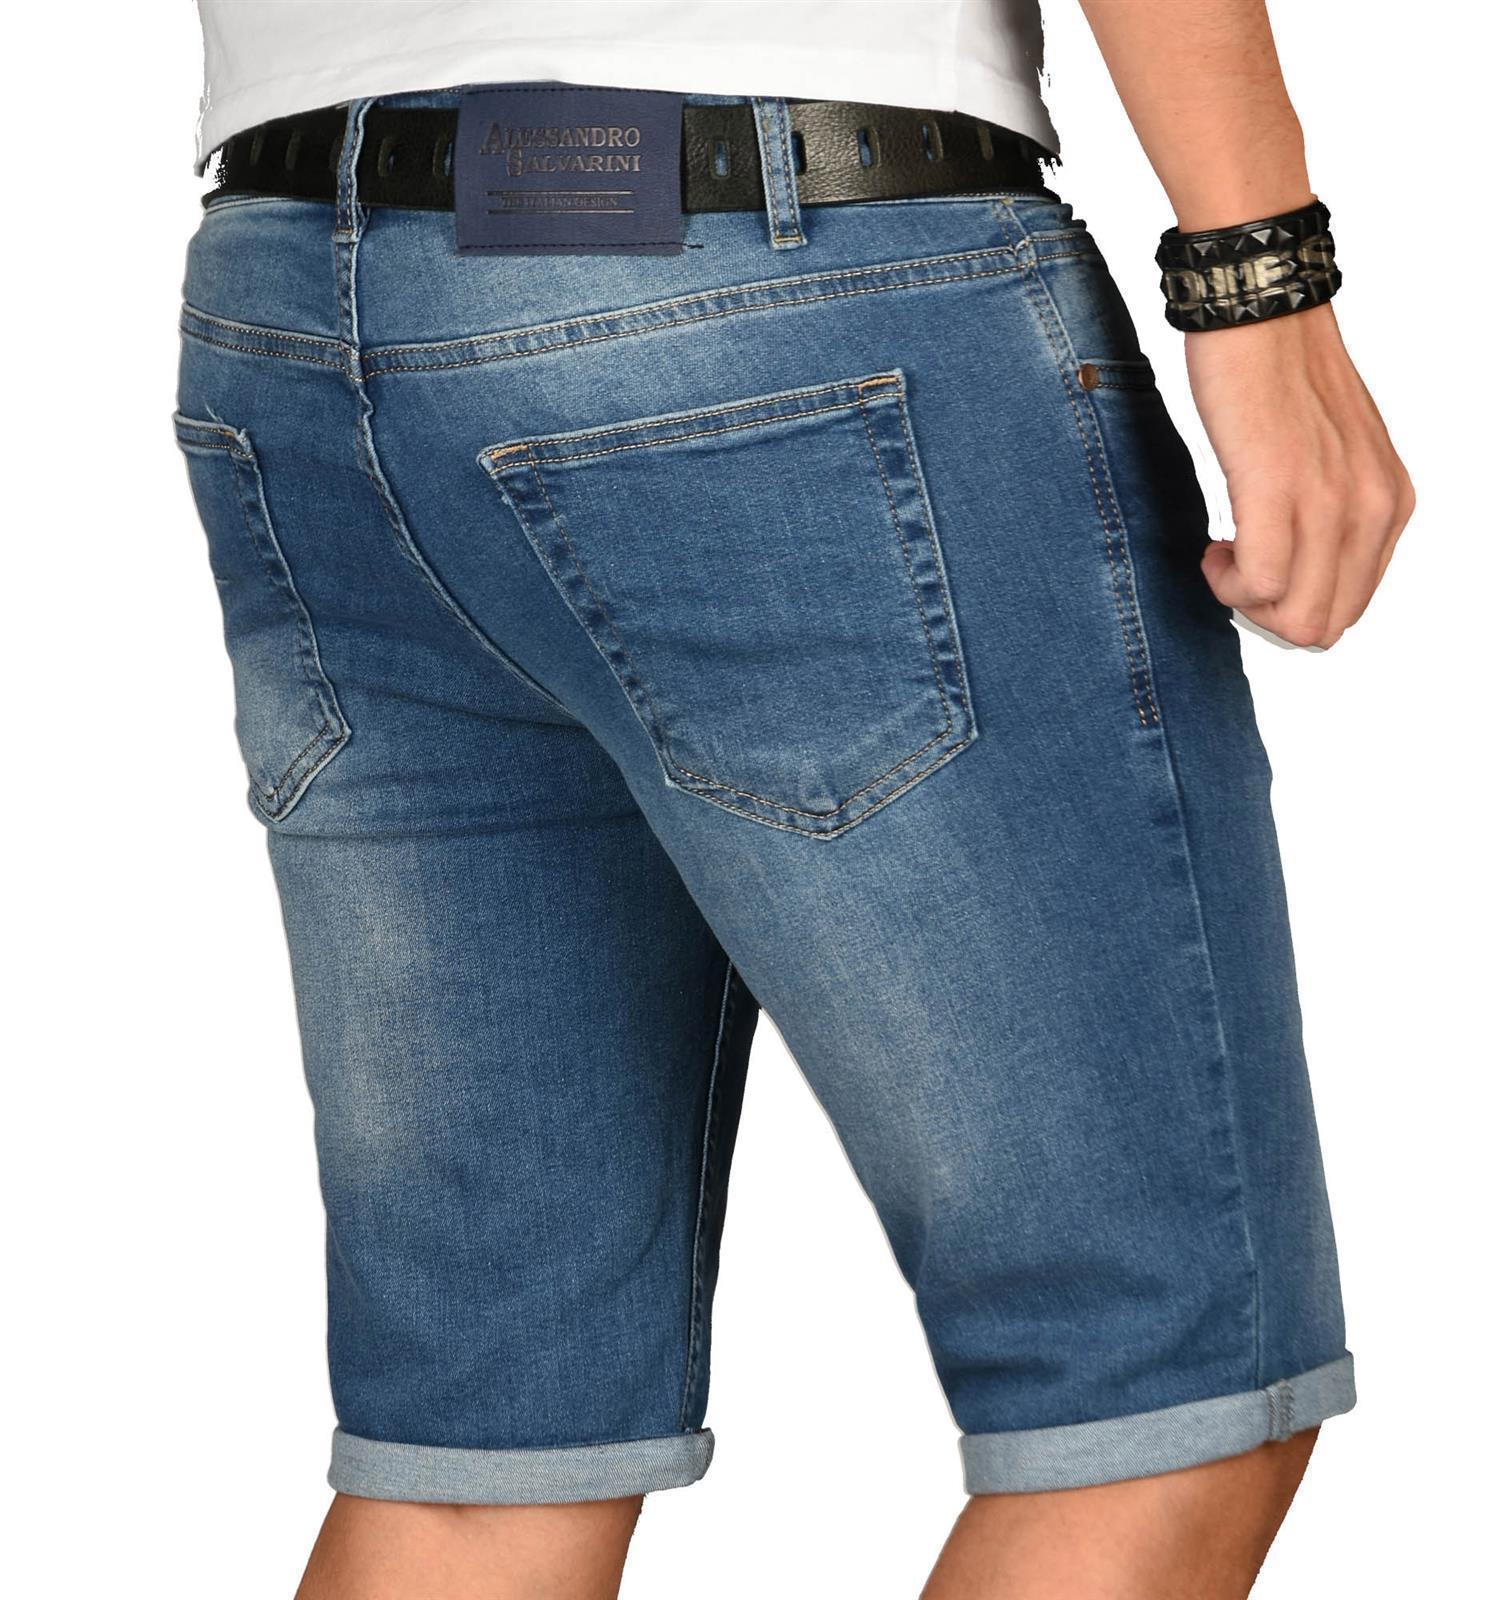 A-Salvarini-Herren-Designer-Jeans-Short-kurze-Hose-Slim-Sommer-Shorts-Washed Indexbild 28